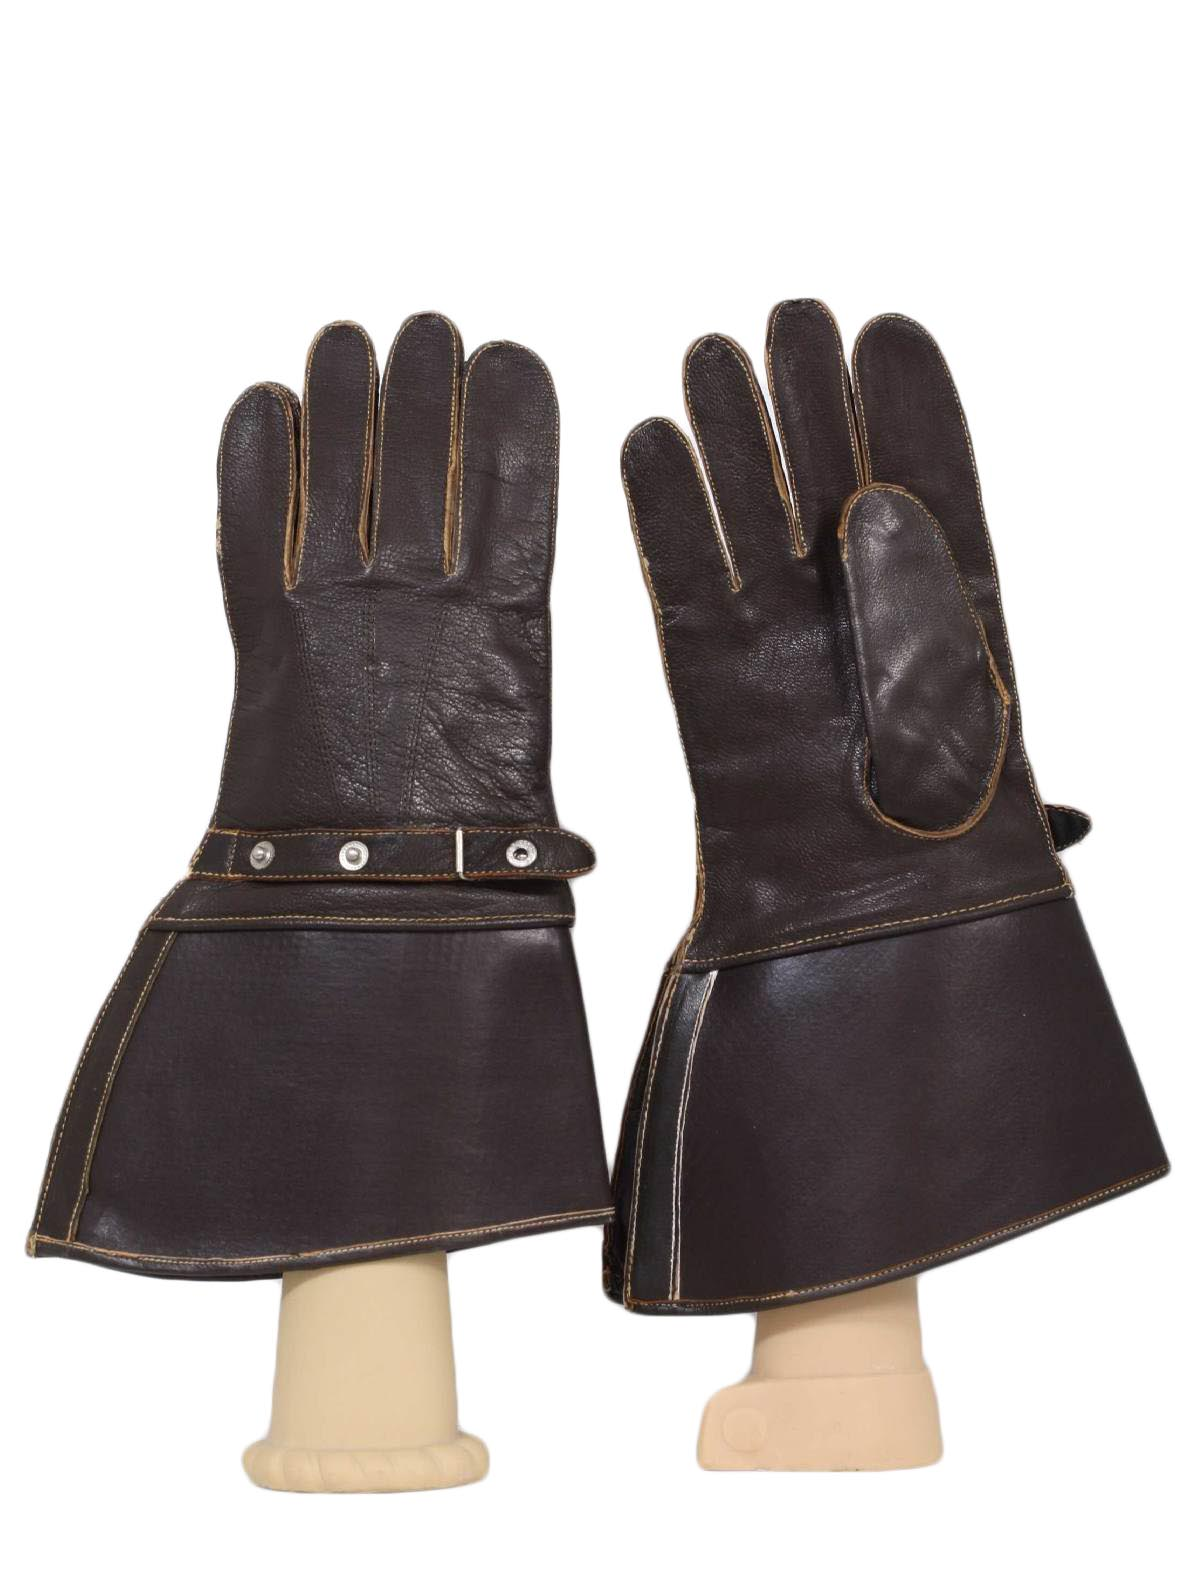 Vintage mens leather gloves - 50s Vintage J F Stocko Gloves 50s J F Stocko Mens Brown Smooth Leather Motorcycle Or Pilot Gloves With Attached Gusseted Wrist Gauntlets